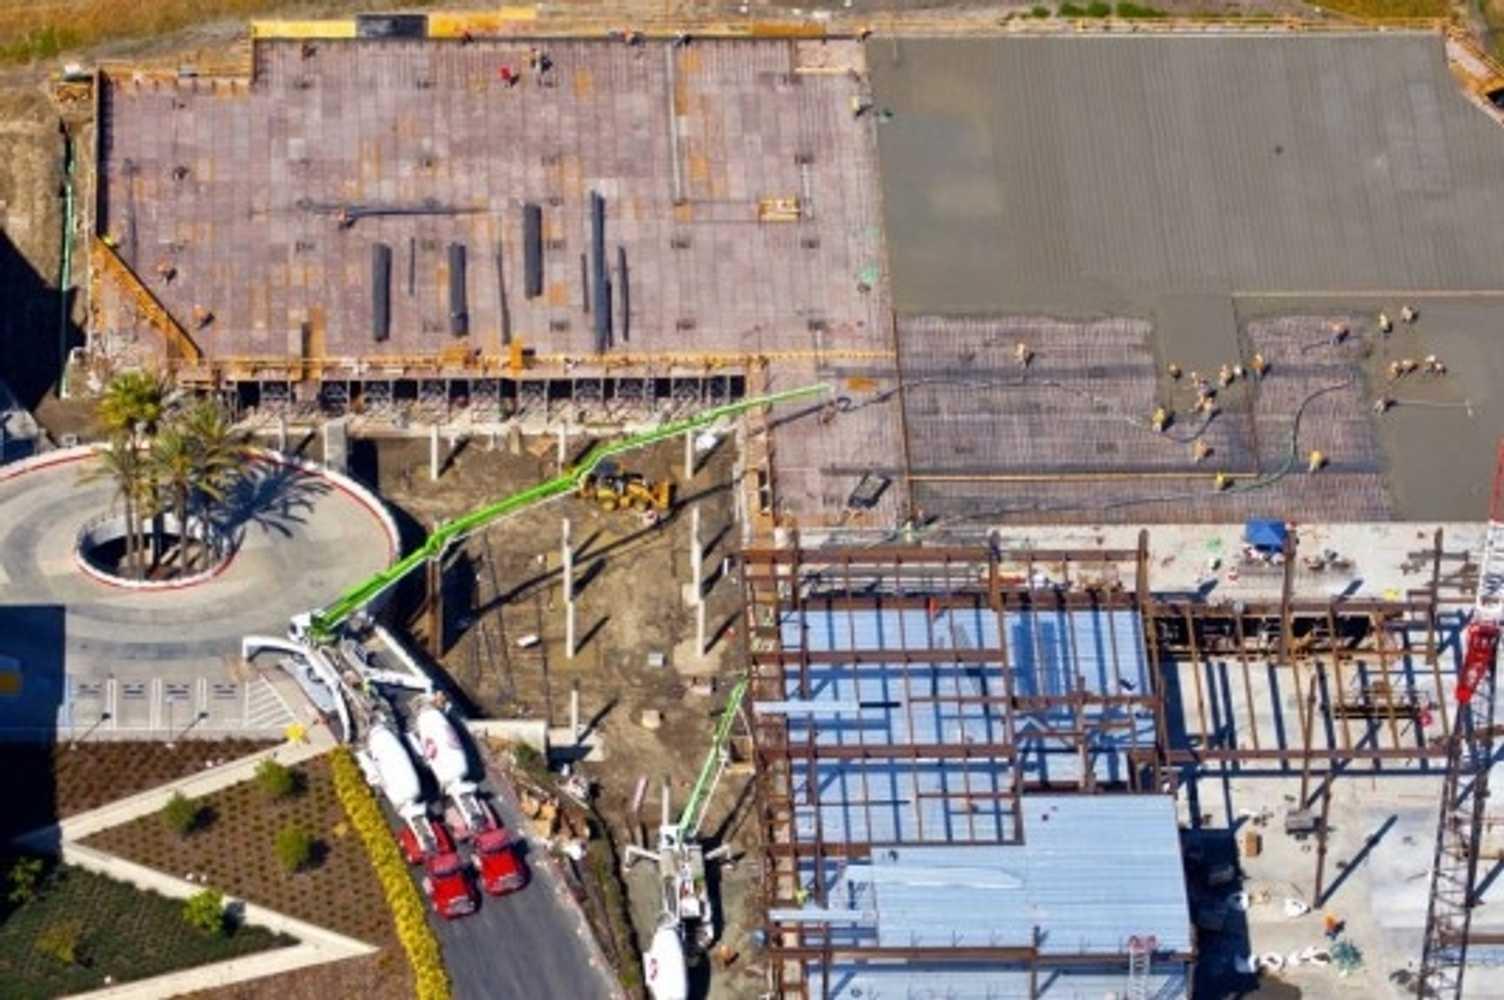 Conco Commercial Concrete Contractors, Fontana, CA